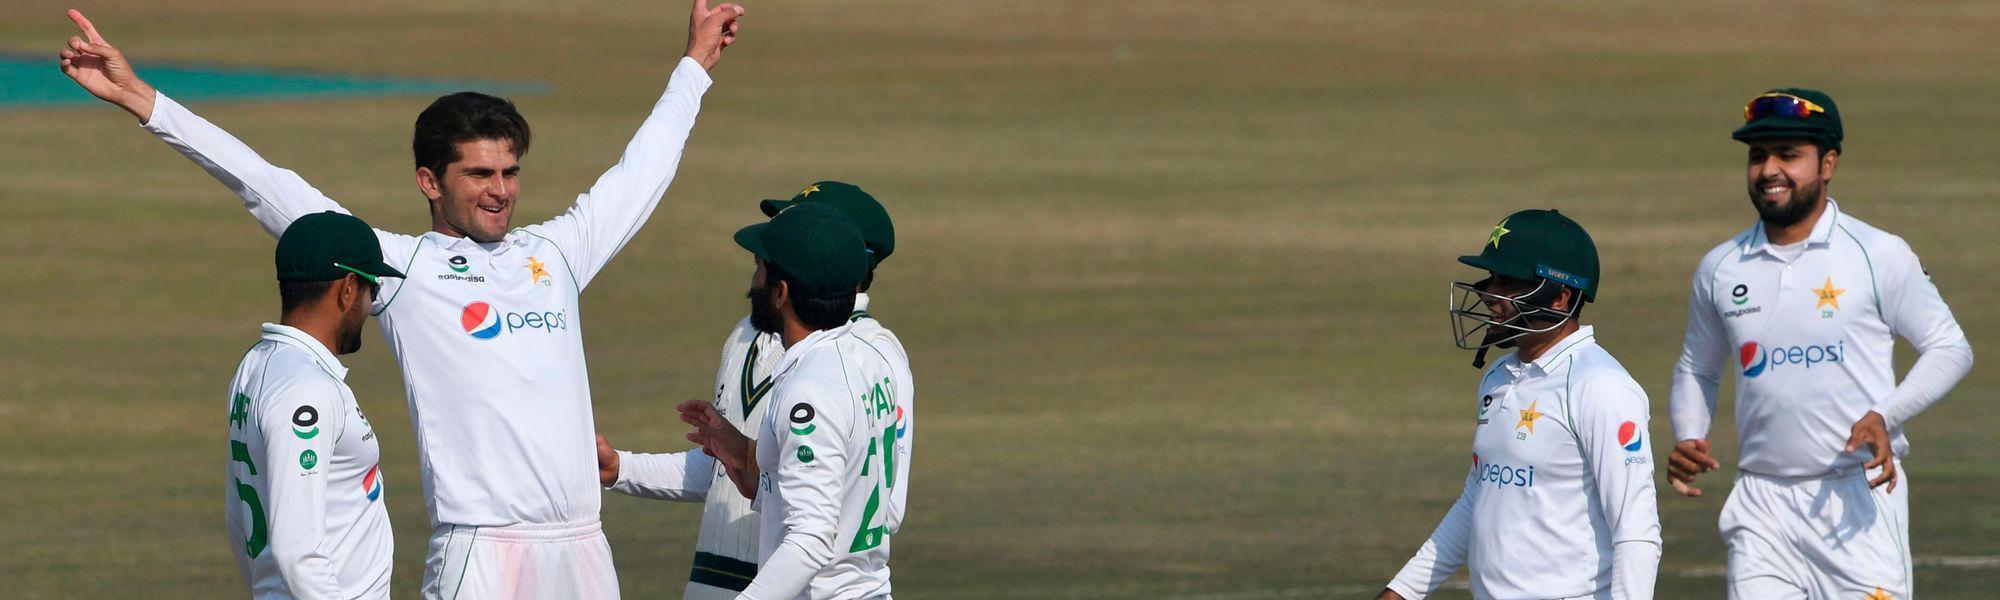 Pakistan celebration